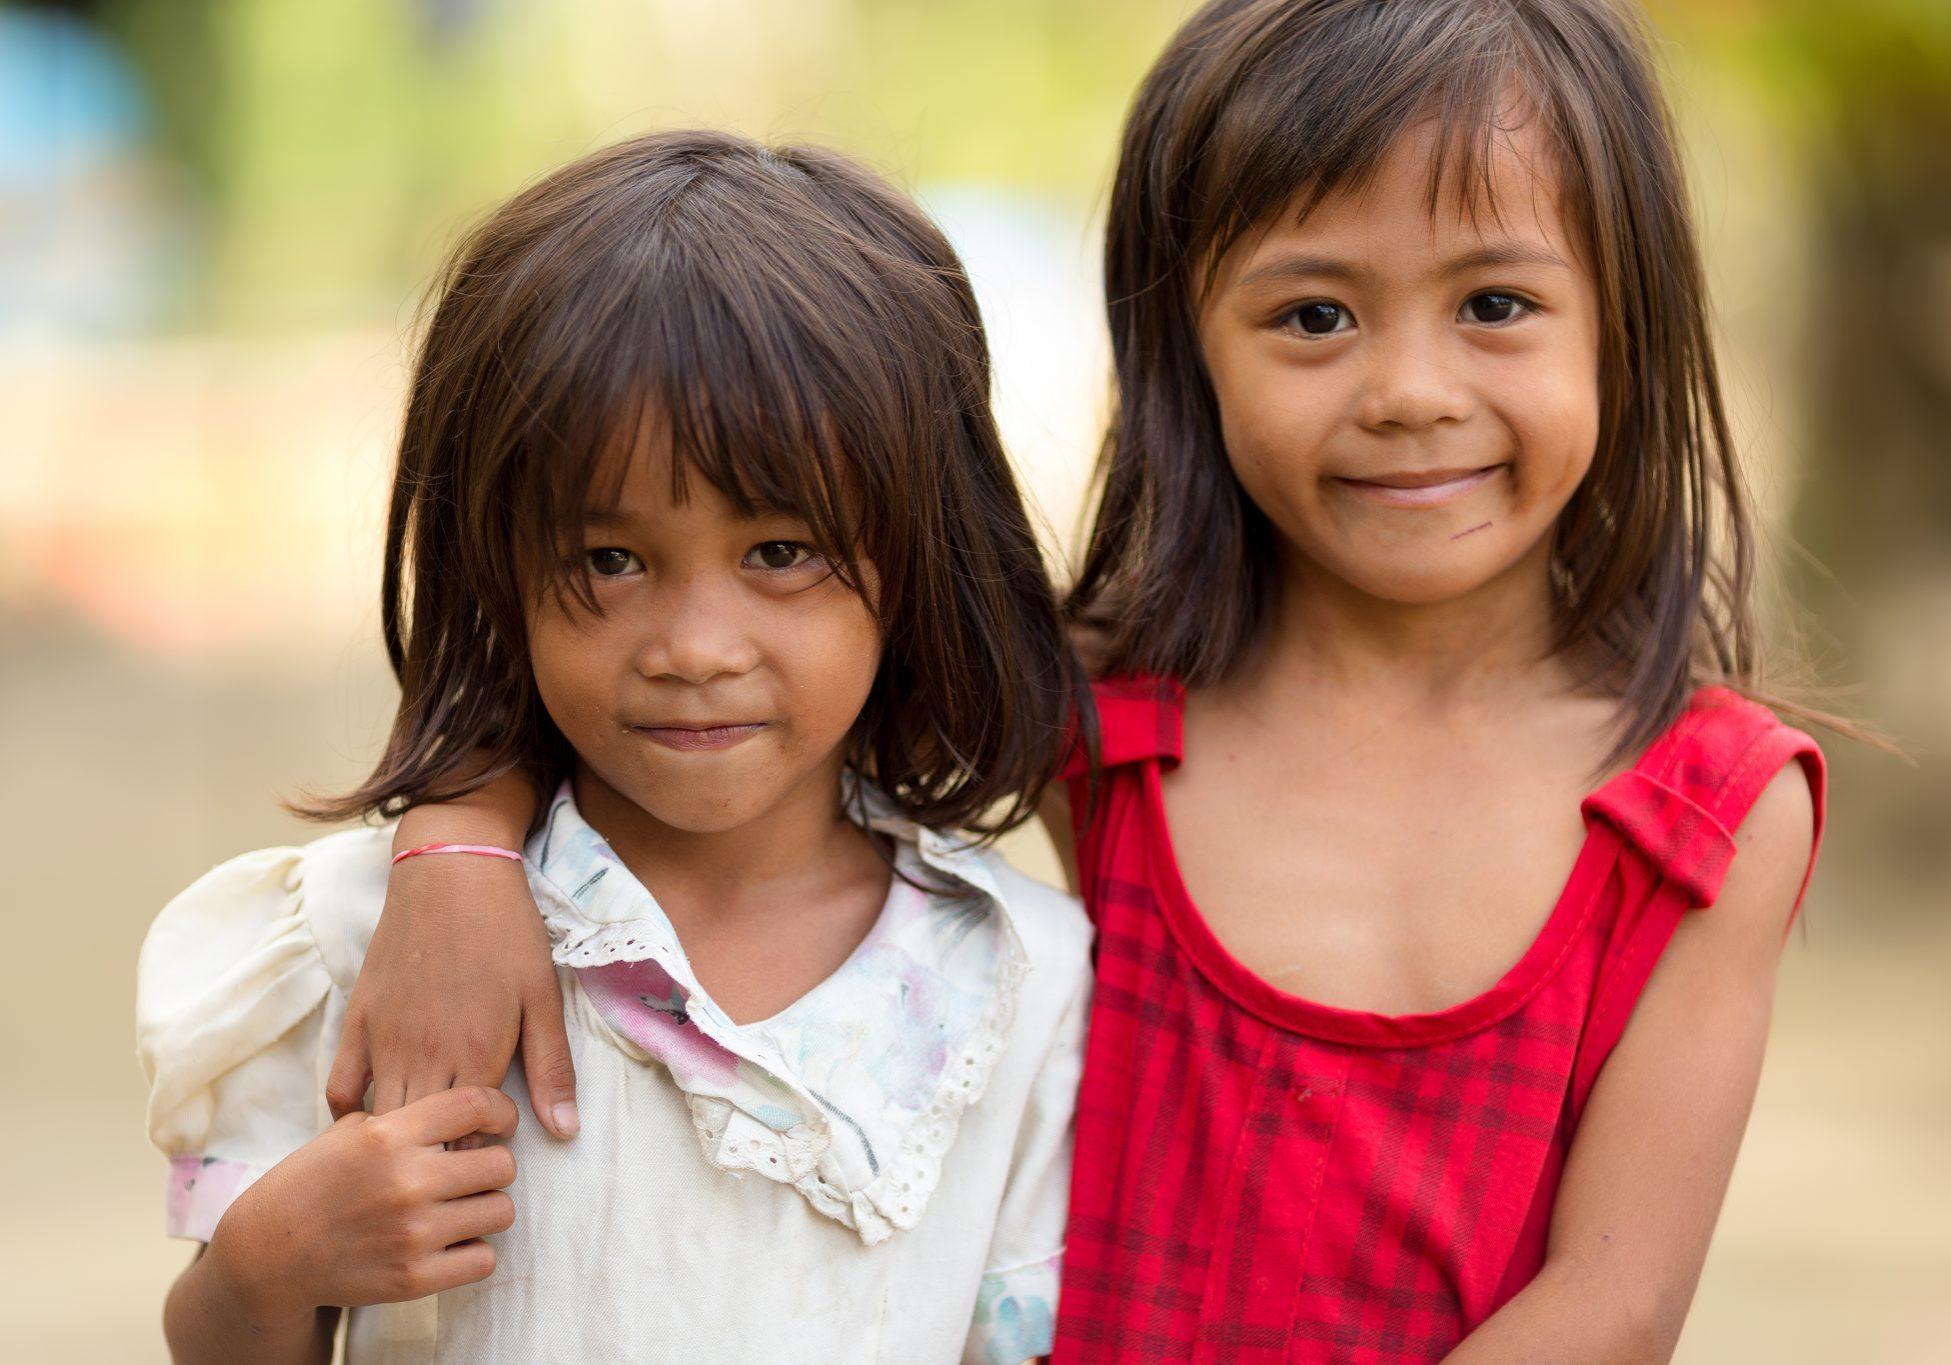 bigstock-EL-NIDO-PHILIPPINES-JANUARY--112005410